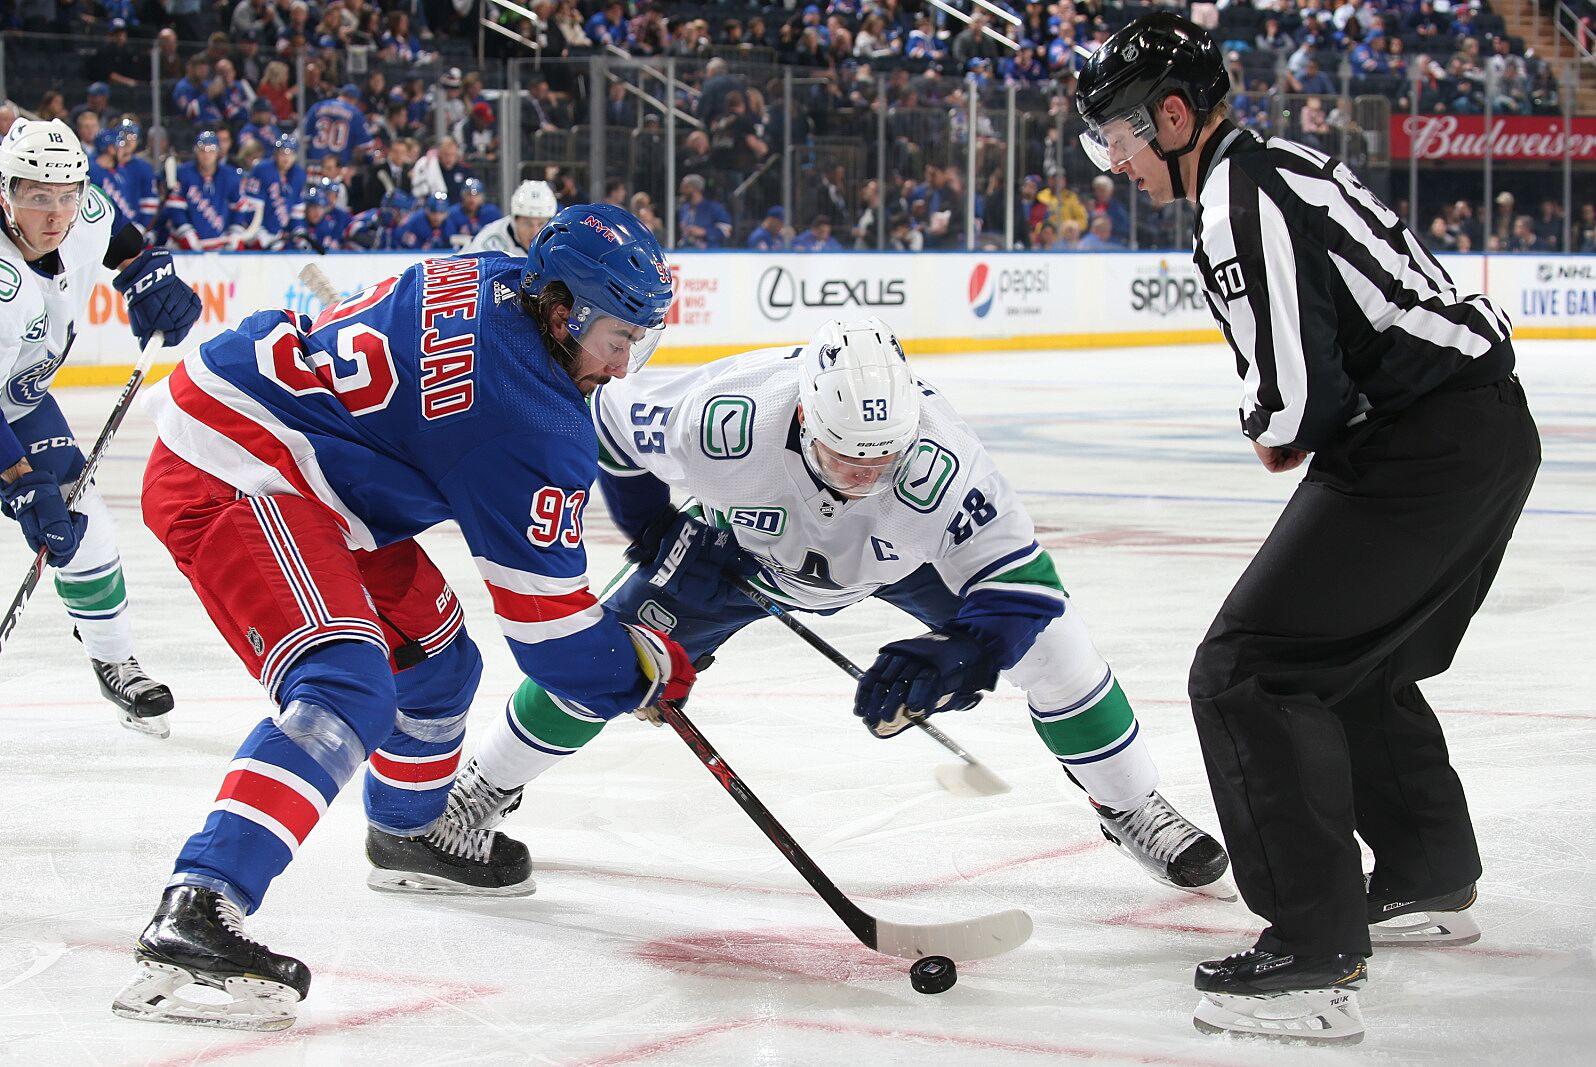 New York Rangers: Sluggish start proves costly in Canucks loss